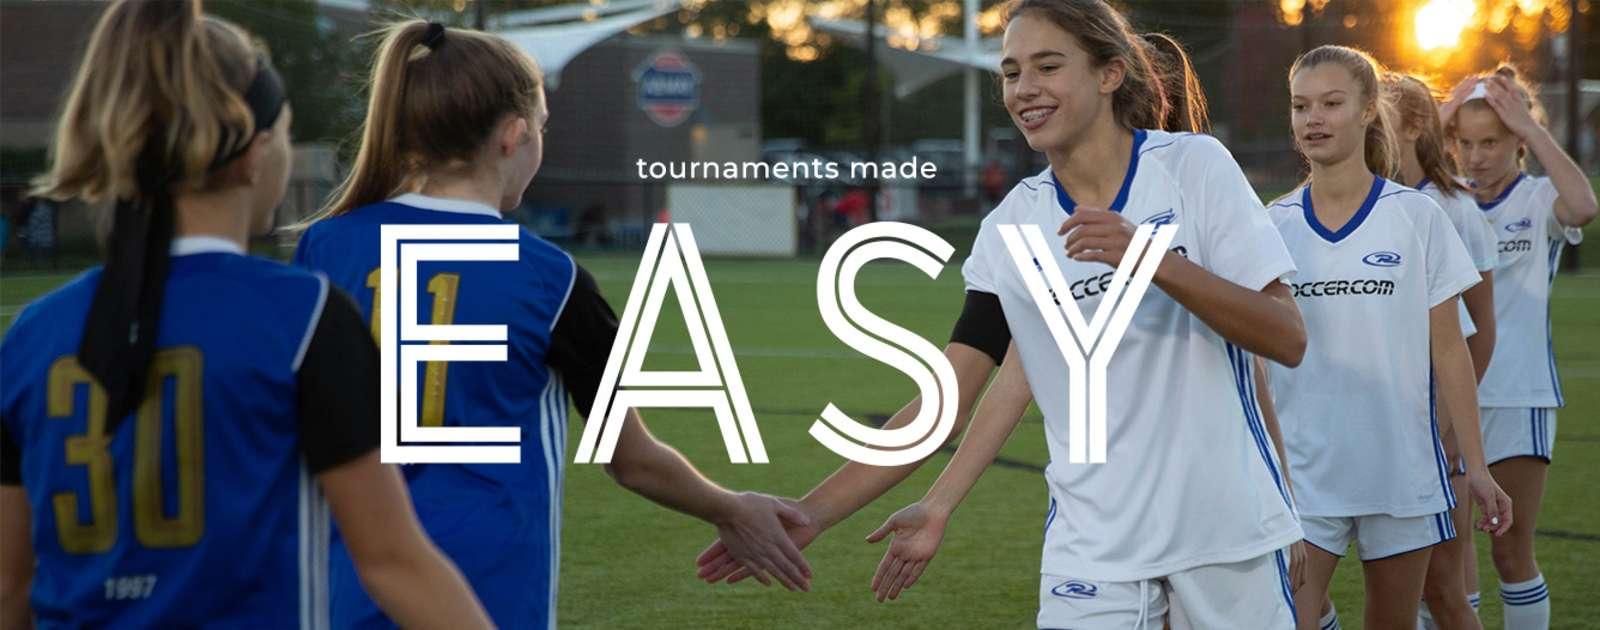 sports tournament easy